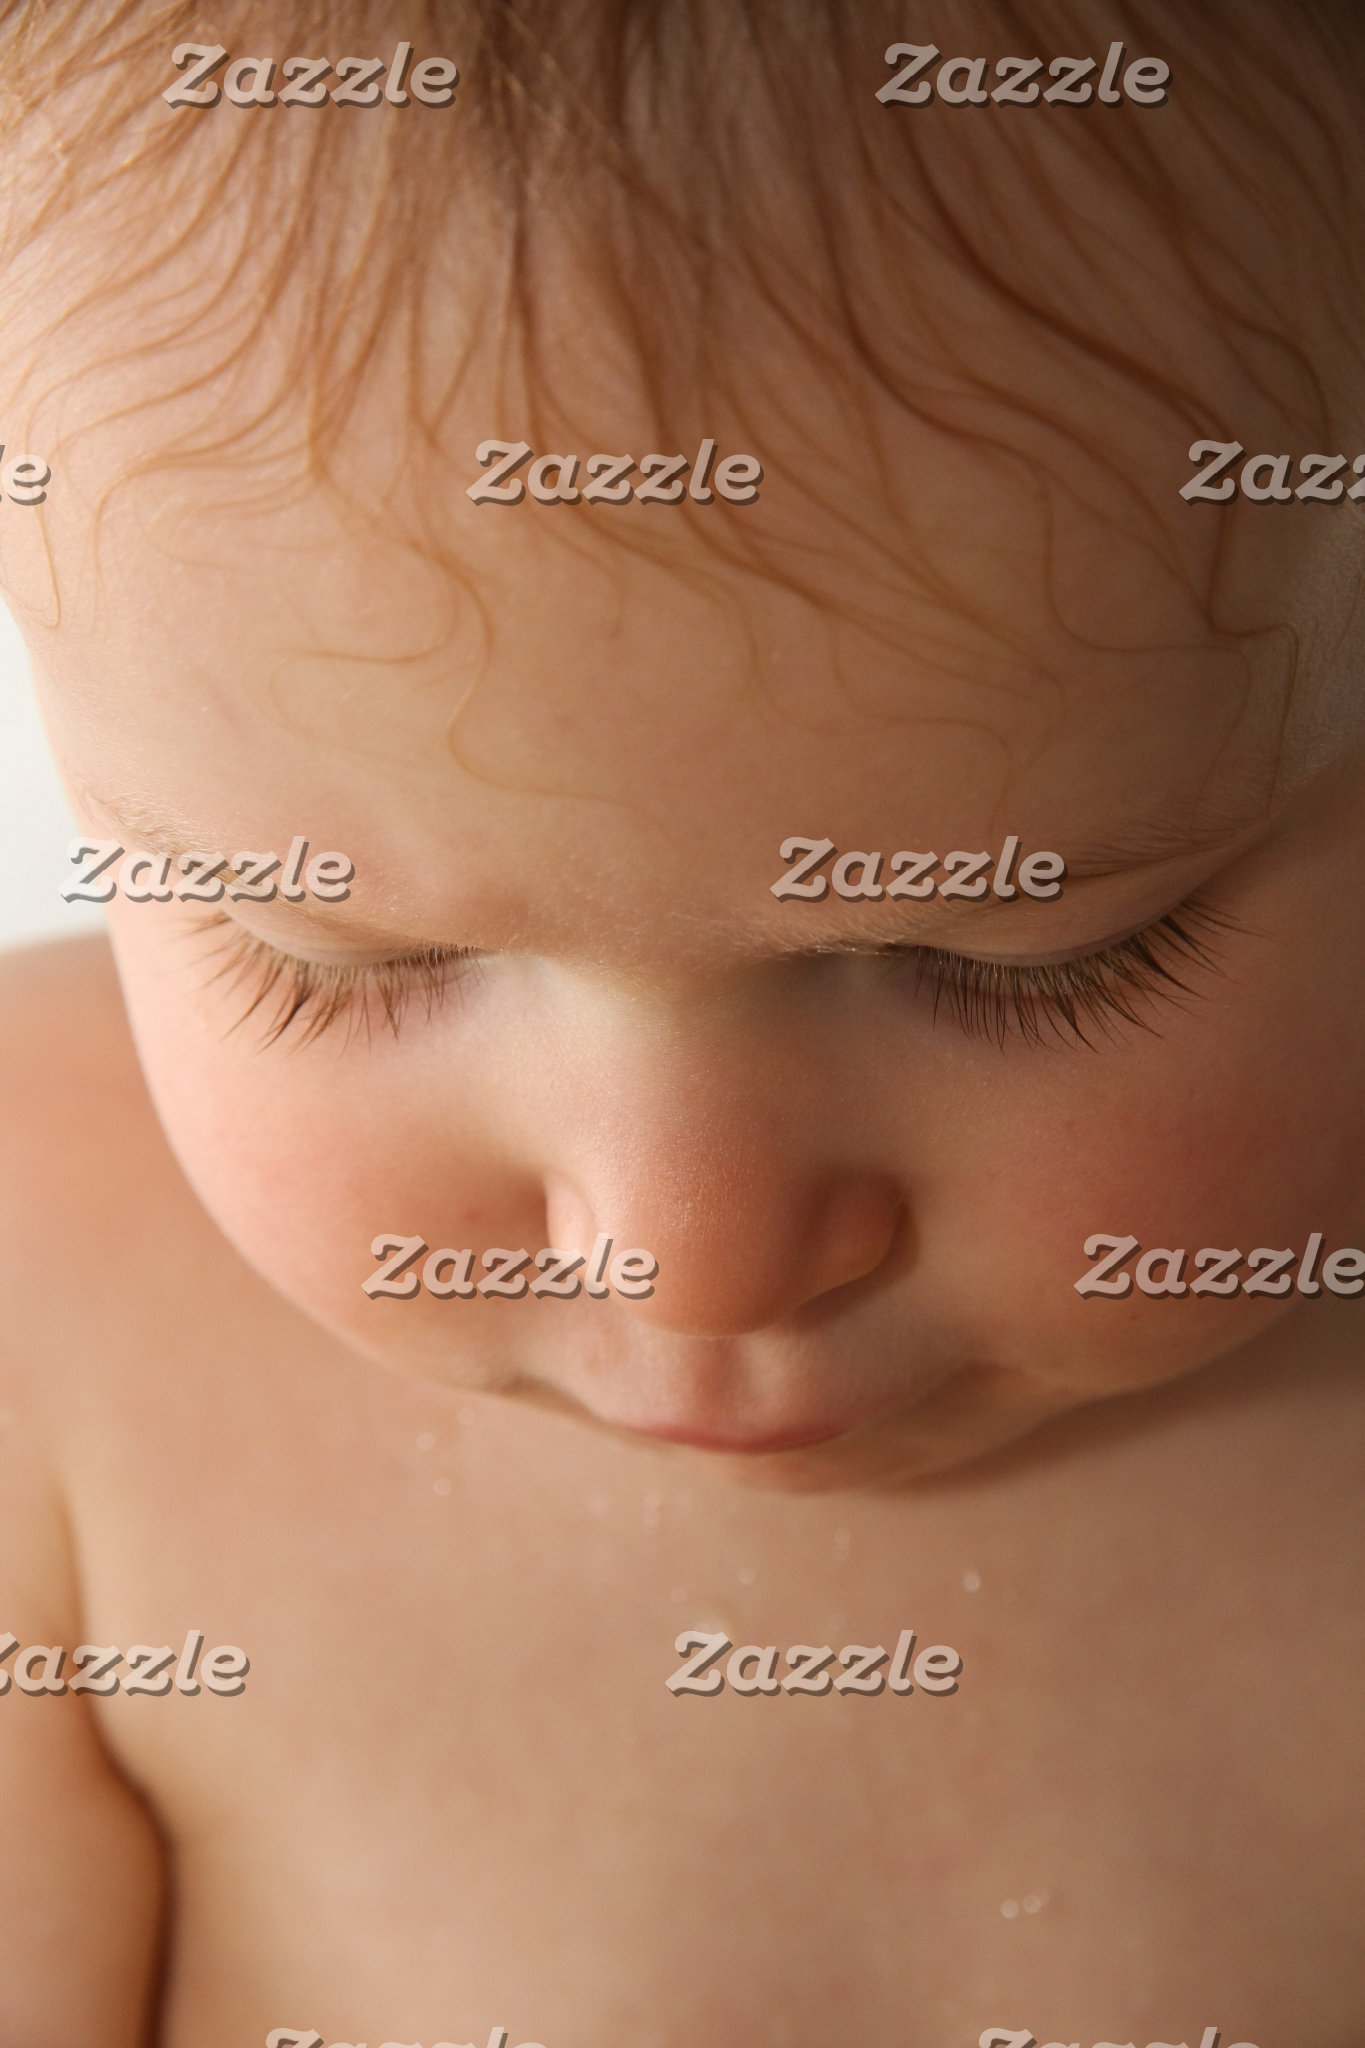 01.) HAMbWG - Baby